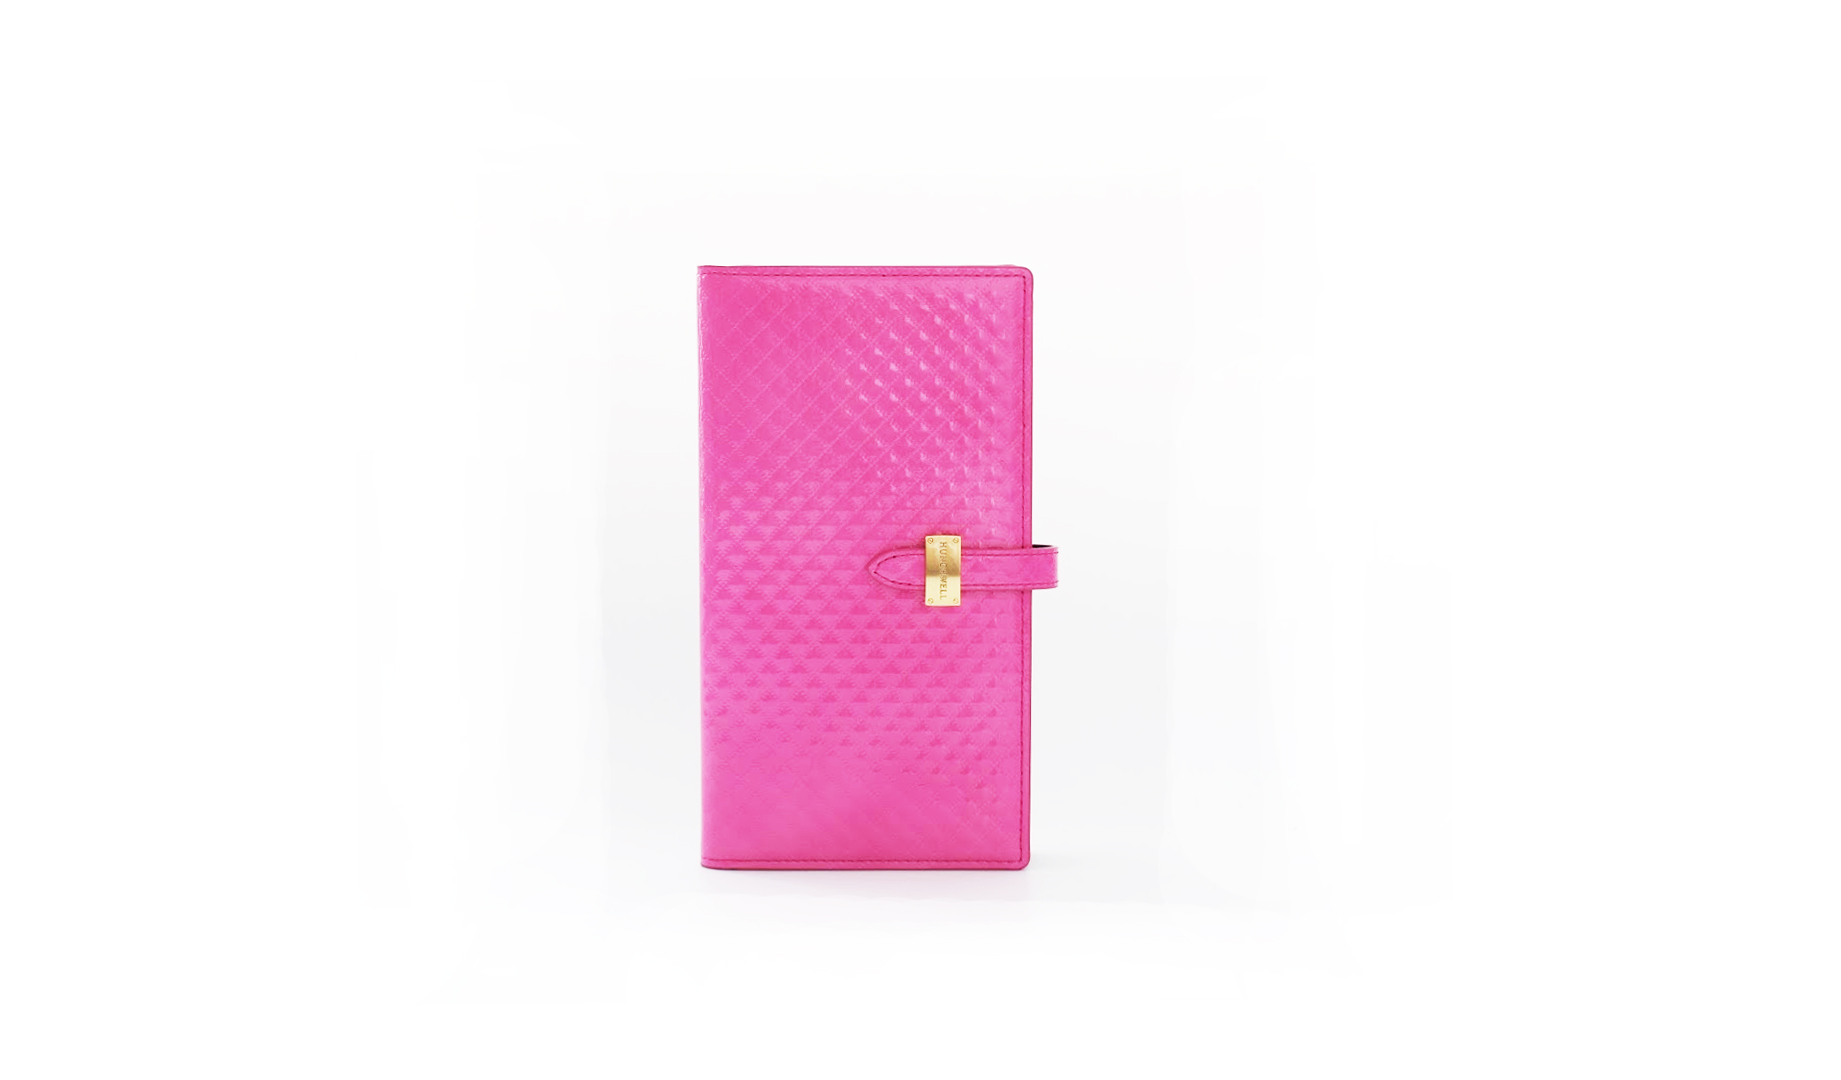 [#S5] Enamel Pink